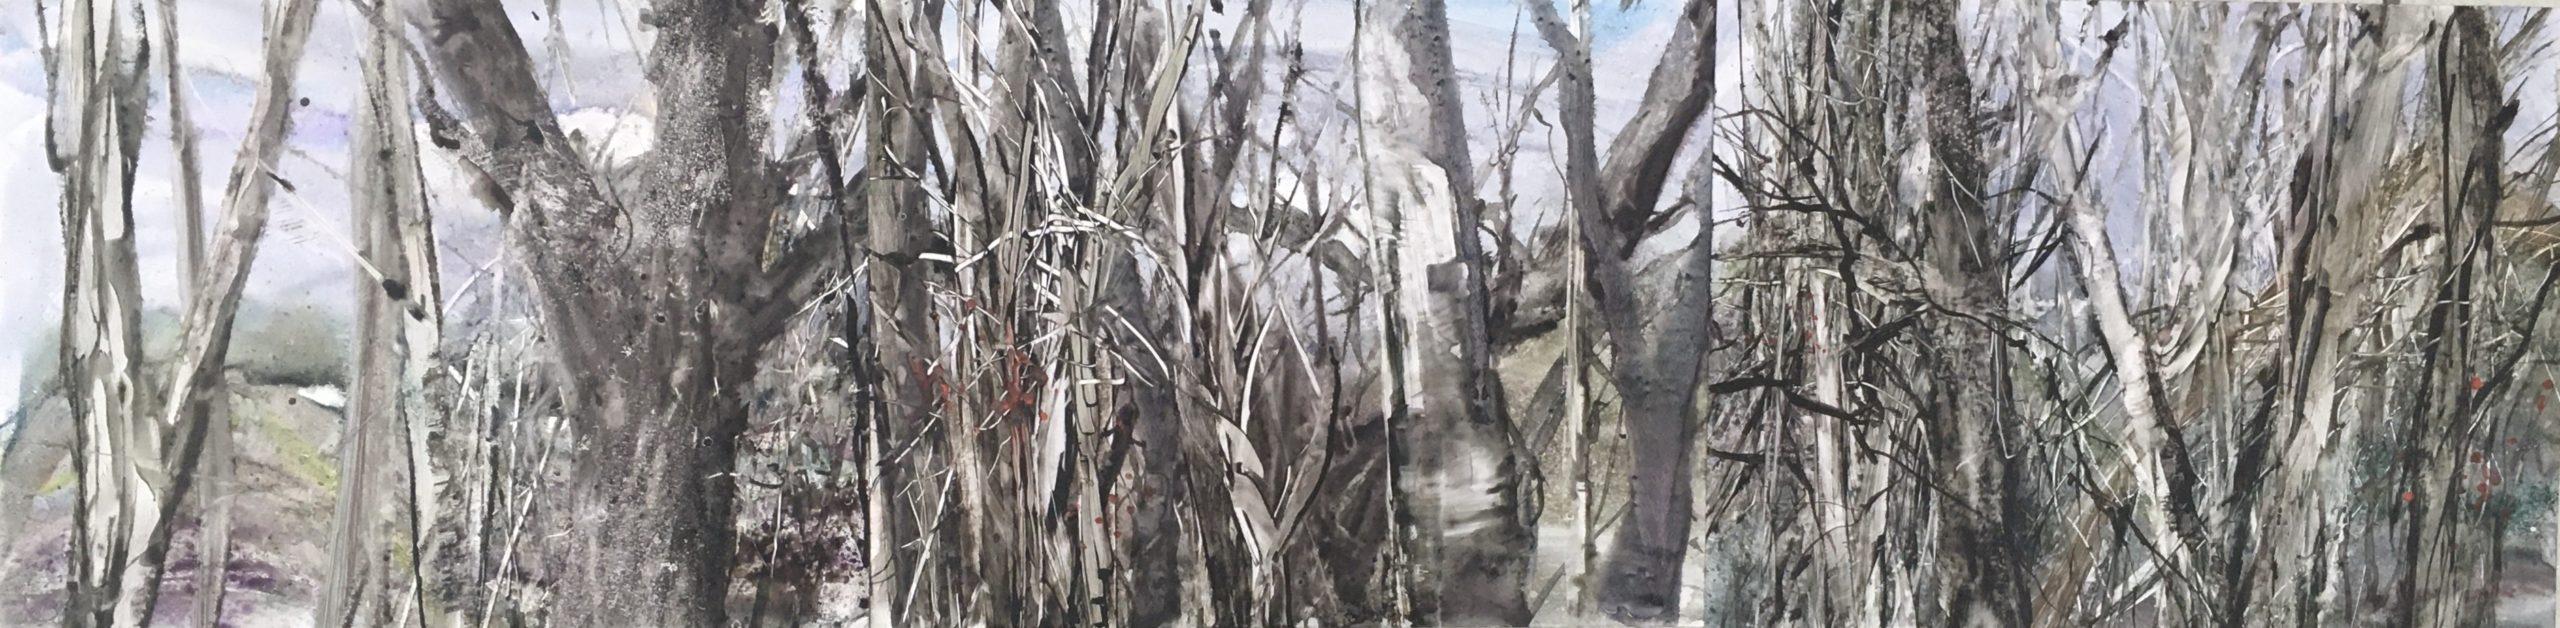 Panorama in watercolor of woods